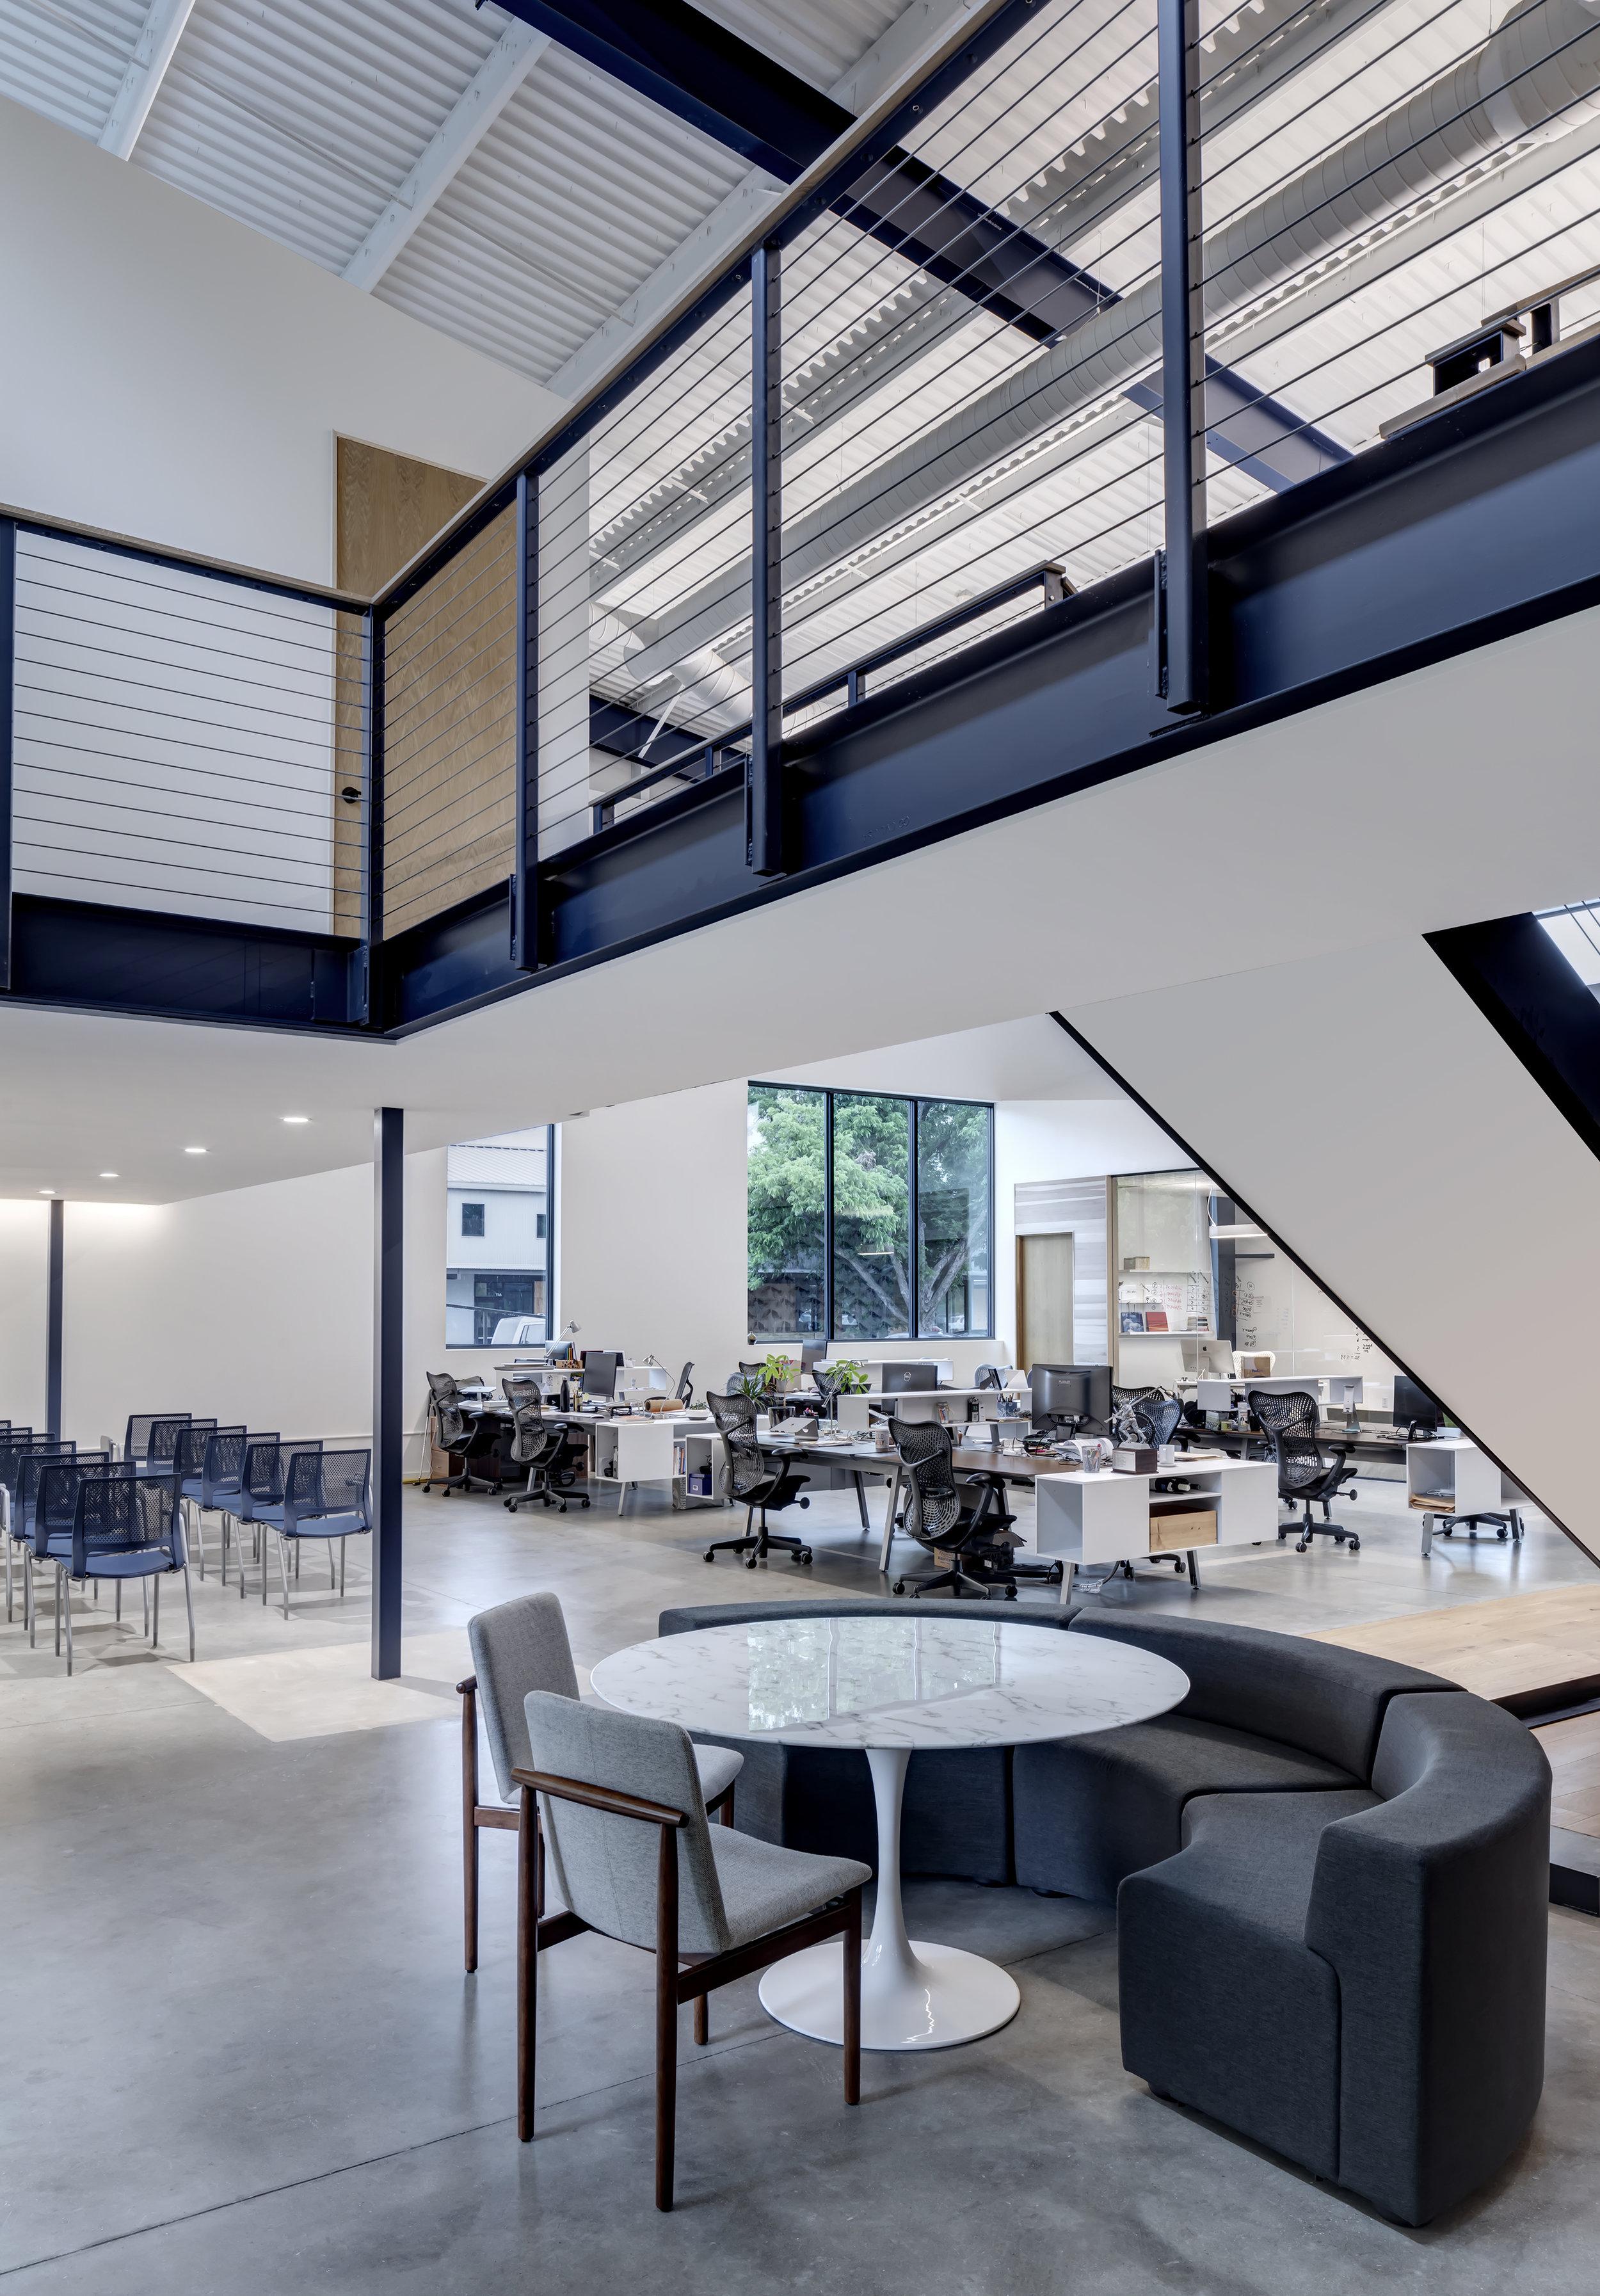 JDI Office by Matt Fajkus MF Architecture. Photo 12 by Charles Davis Smith.jpg